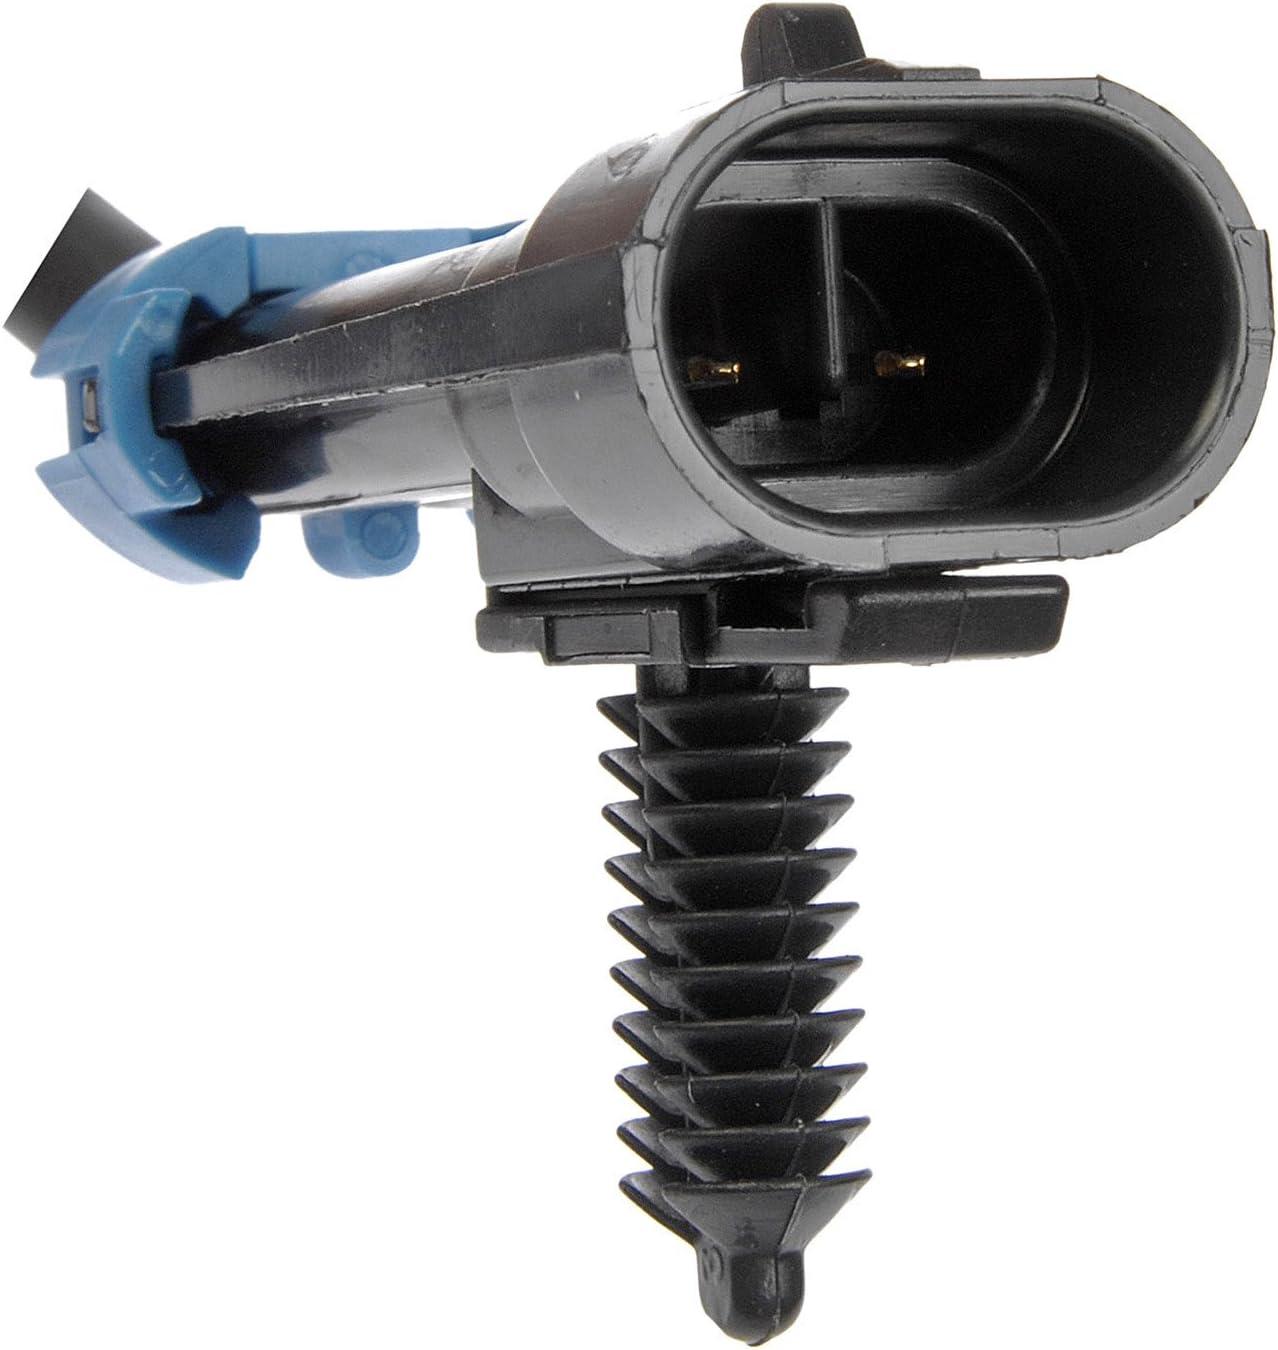 Dorman 970-003 ABS Sensor with Harness